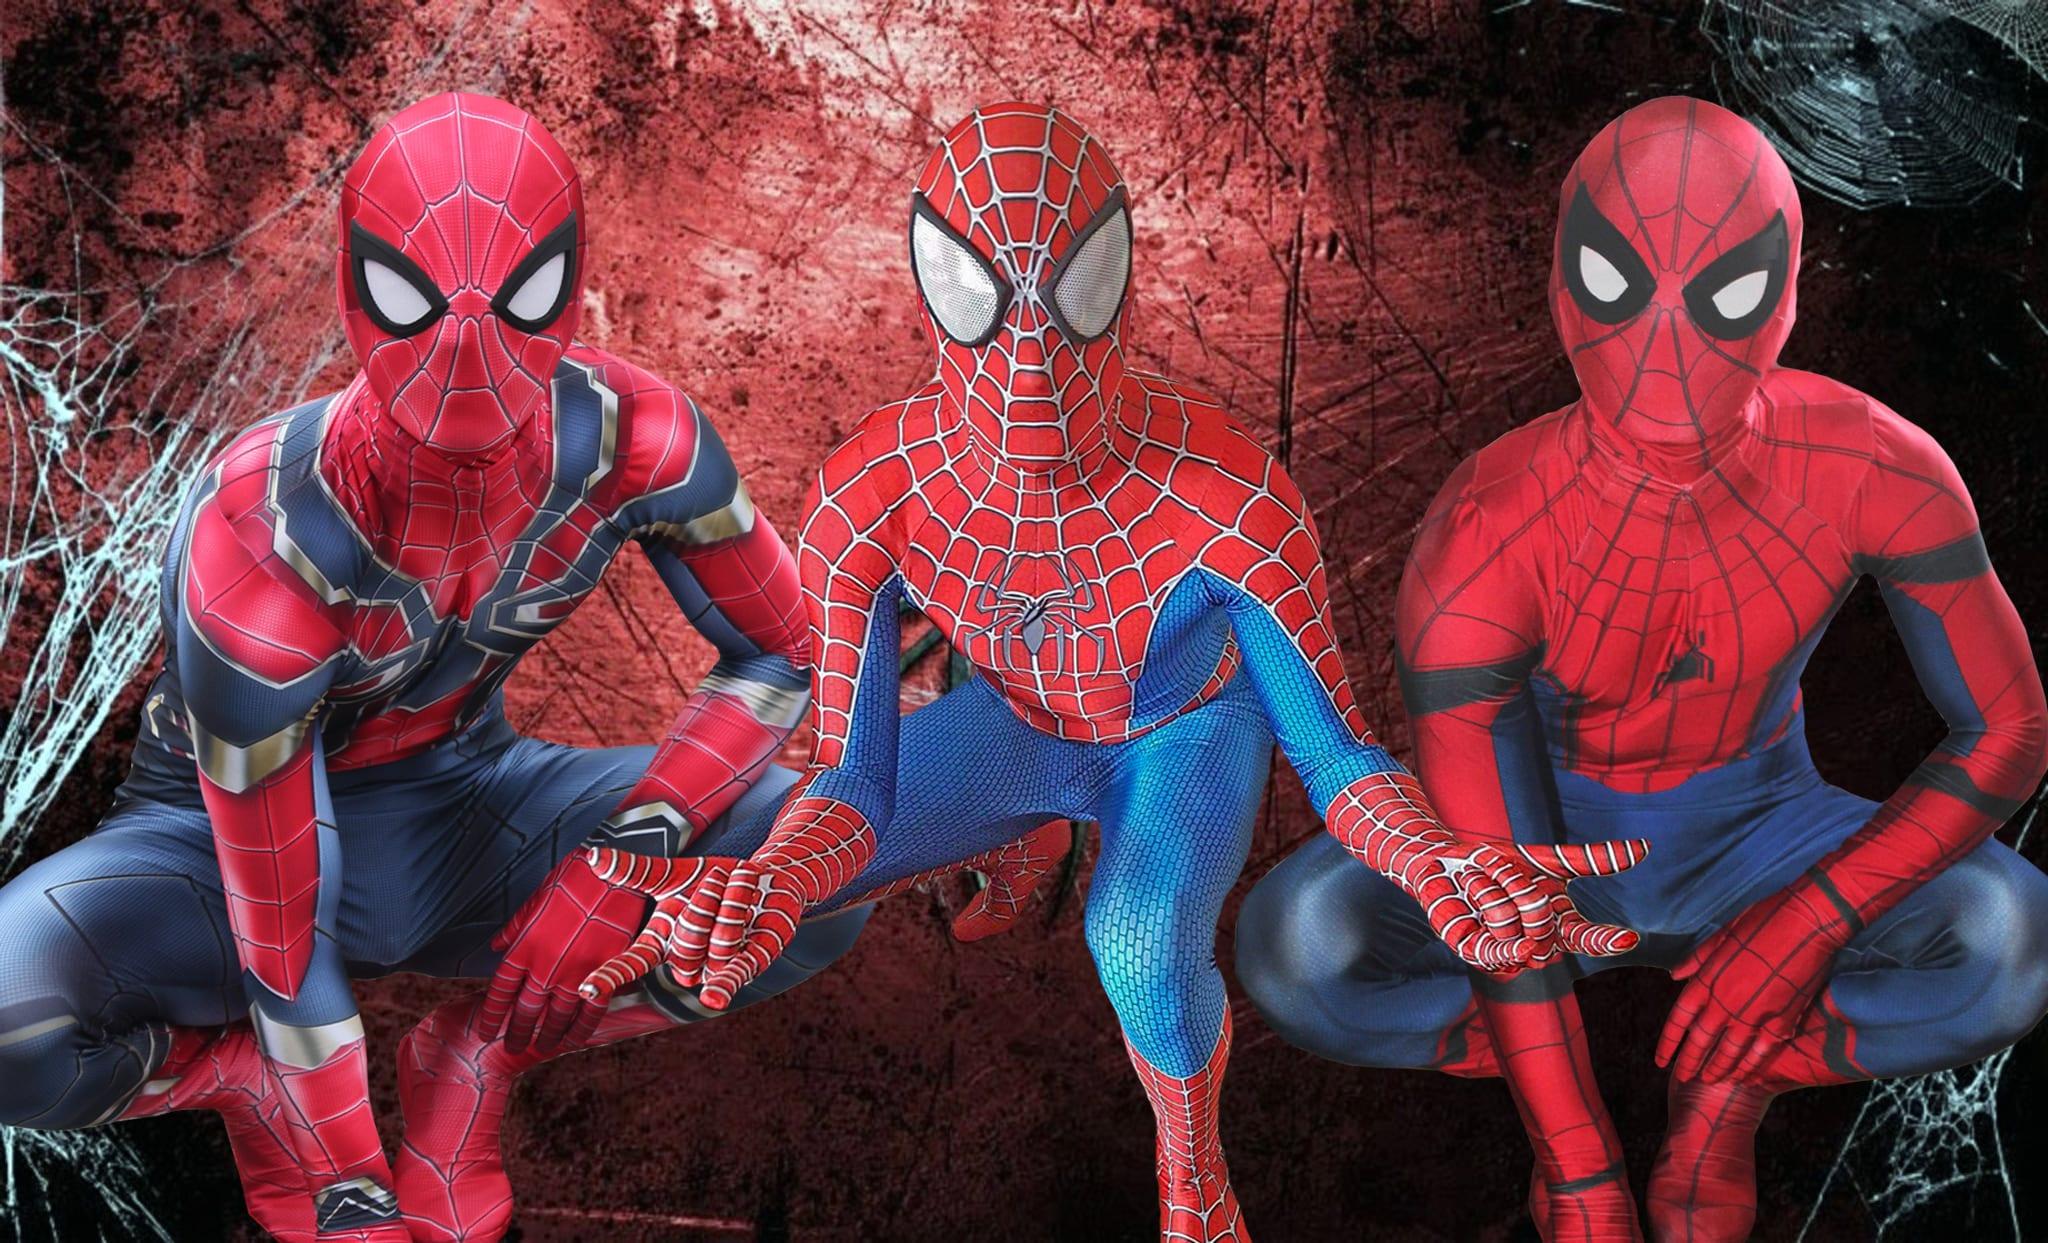 Spider Boys